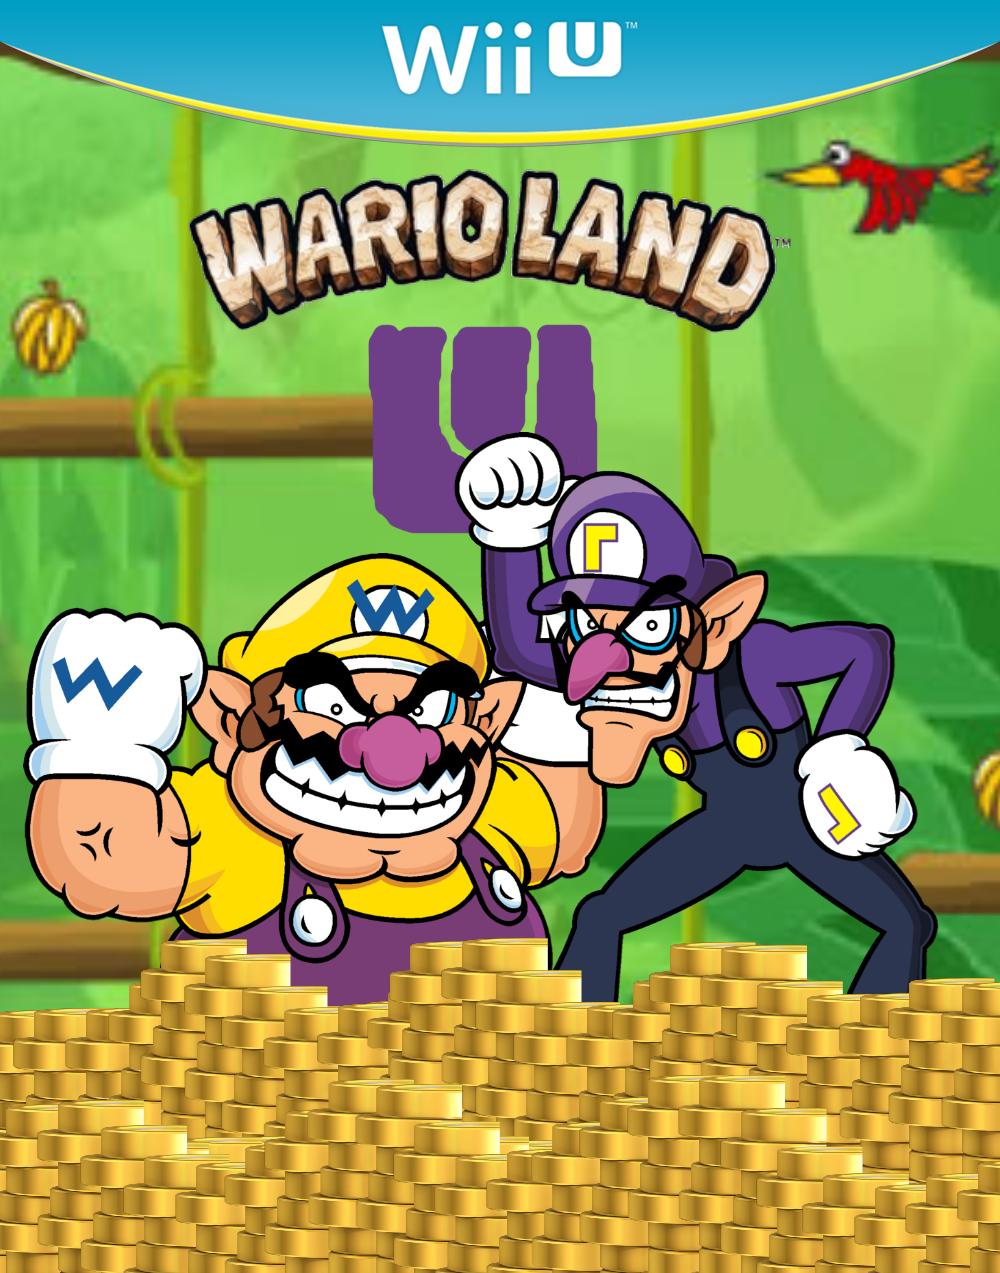 Wario Land U Fantendo Nintendo Fanon Wiki Fandom Powered By Wikia